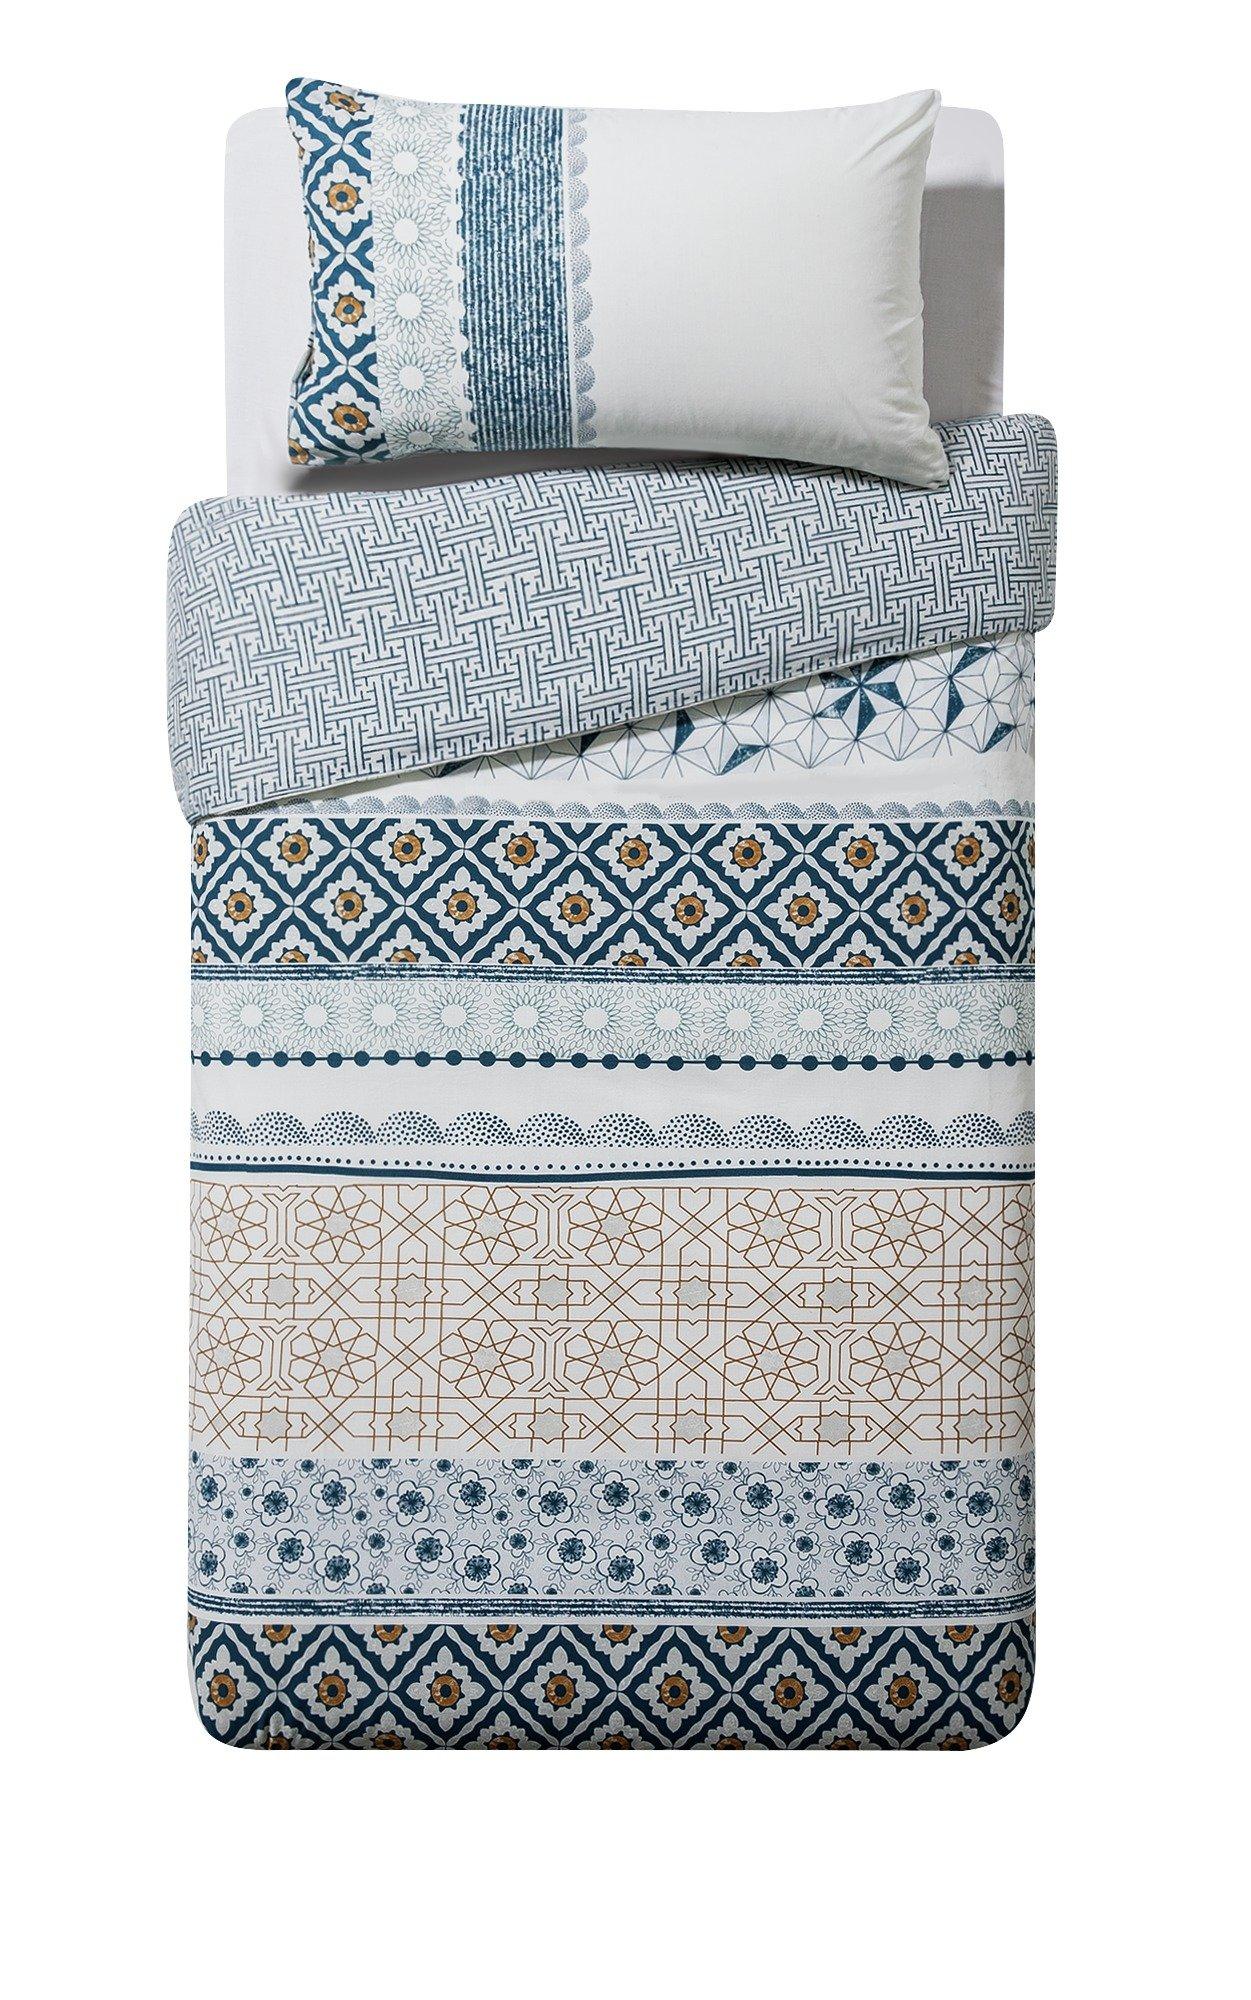 Argos Home Global Patchwork Bedding Set - Single